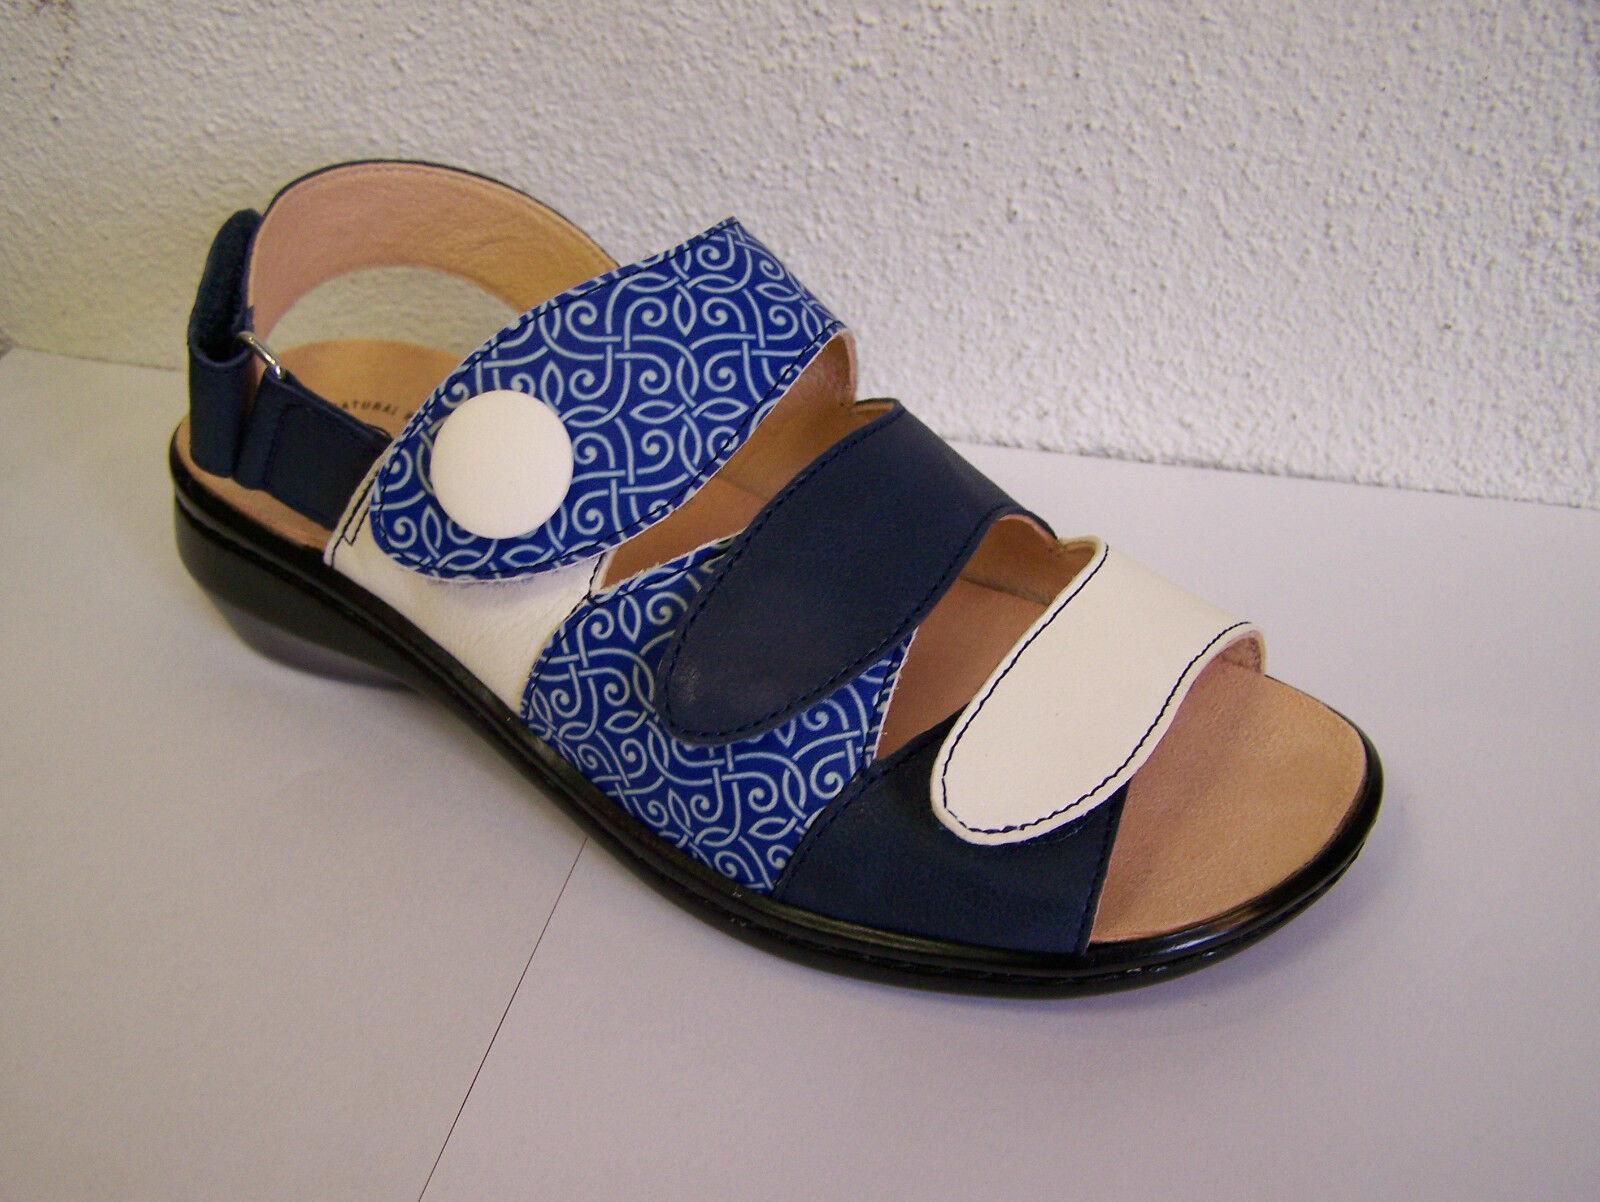 Think! zapato modelo camilla en azul/crema Capri con cambio plantilla